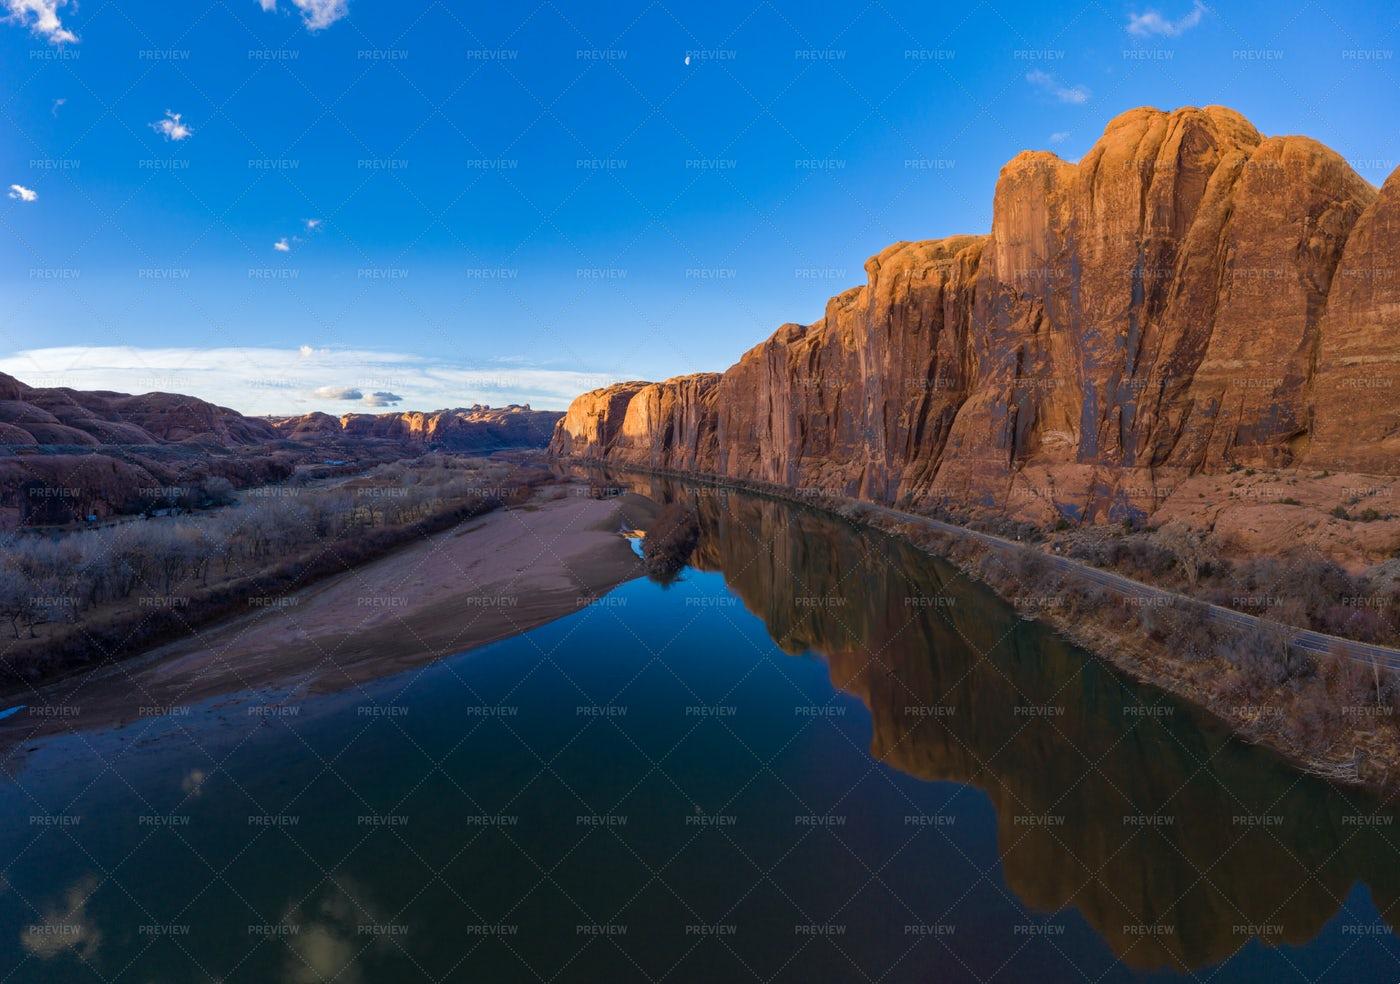 Colorado River And Red Sandstone Cliffs: Stock Photos